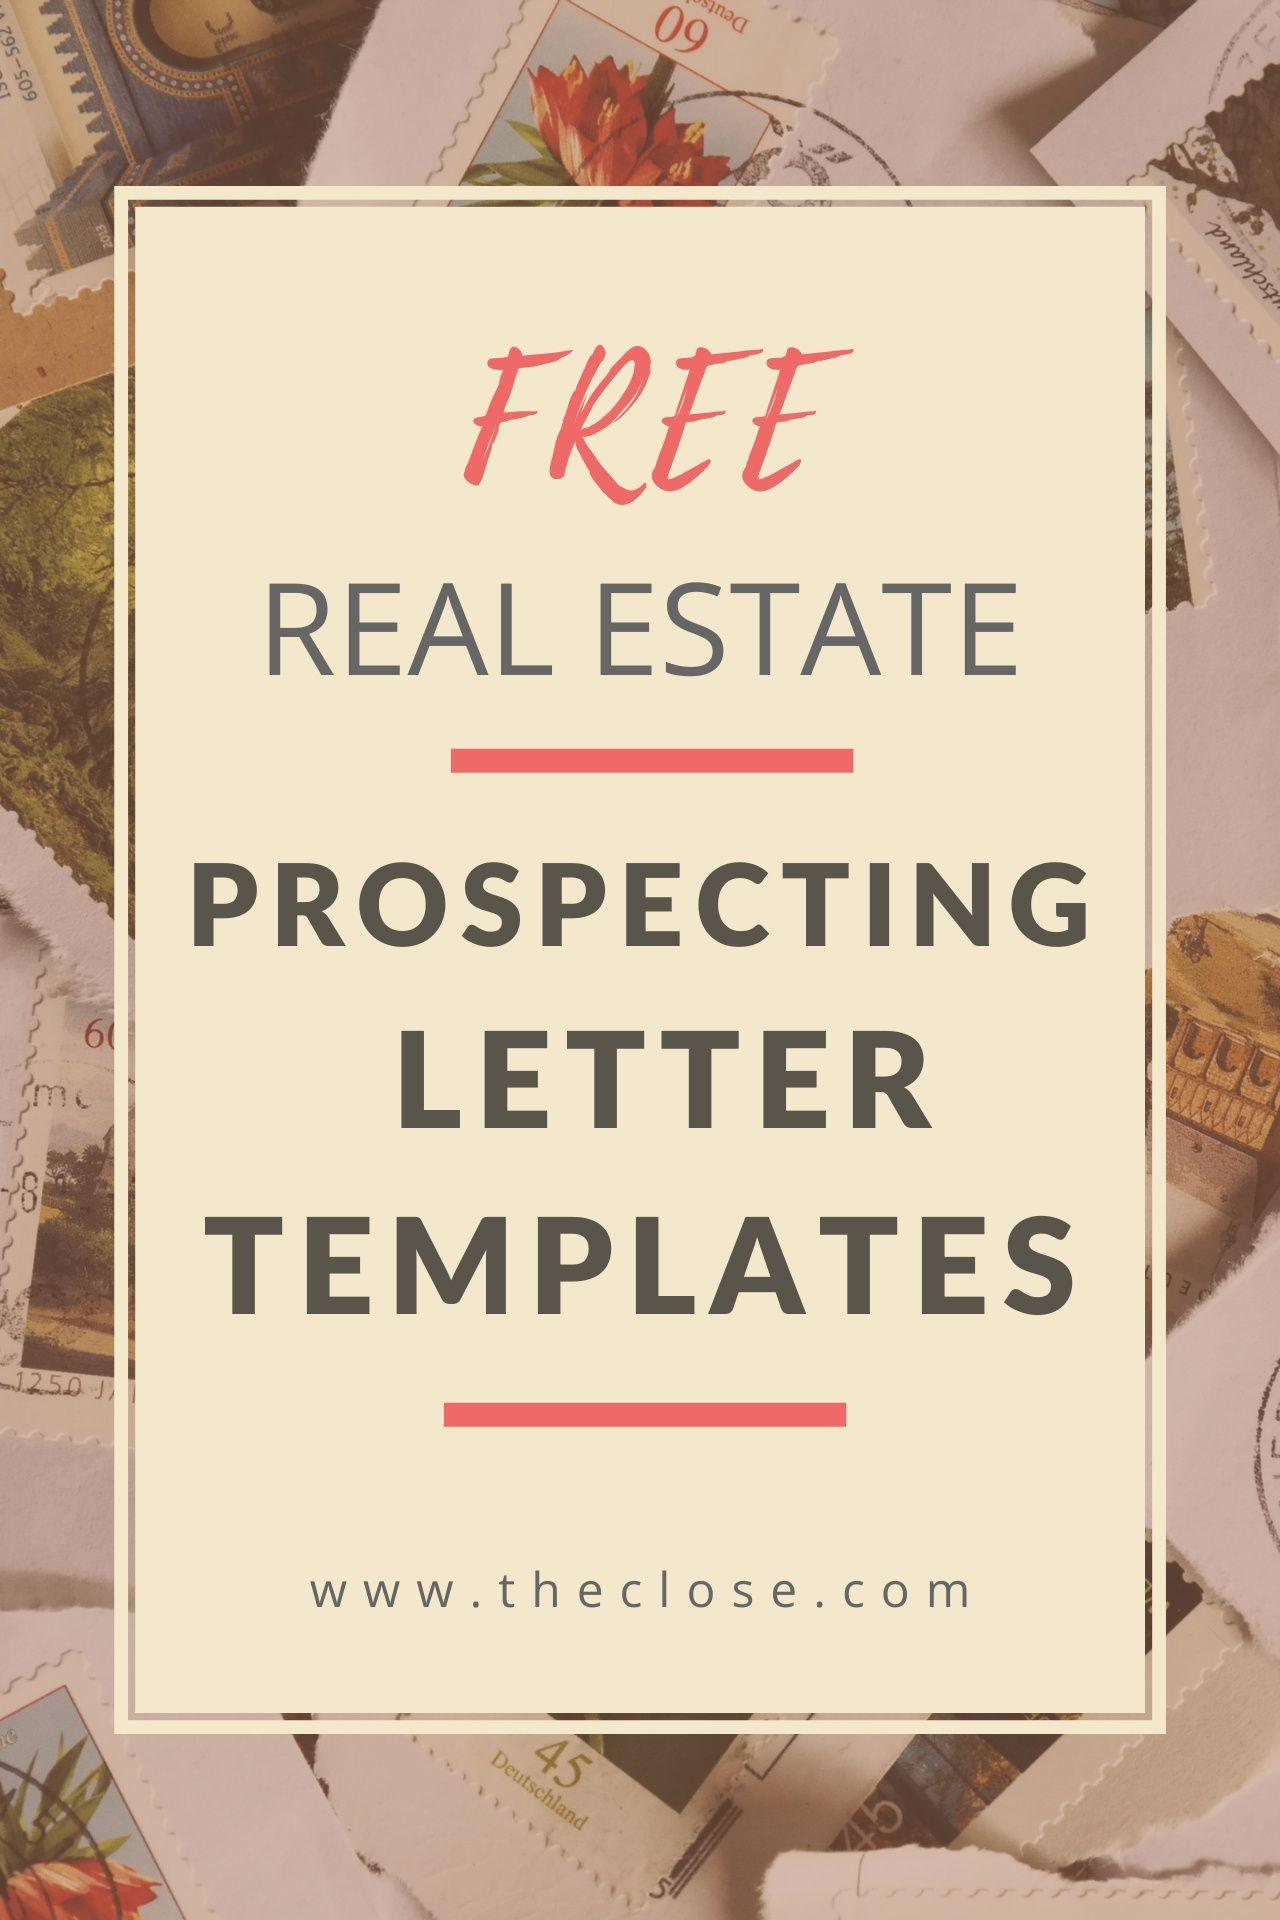 15 Best Real Estate Prospecting Letter Templates for 2020 ...